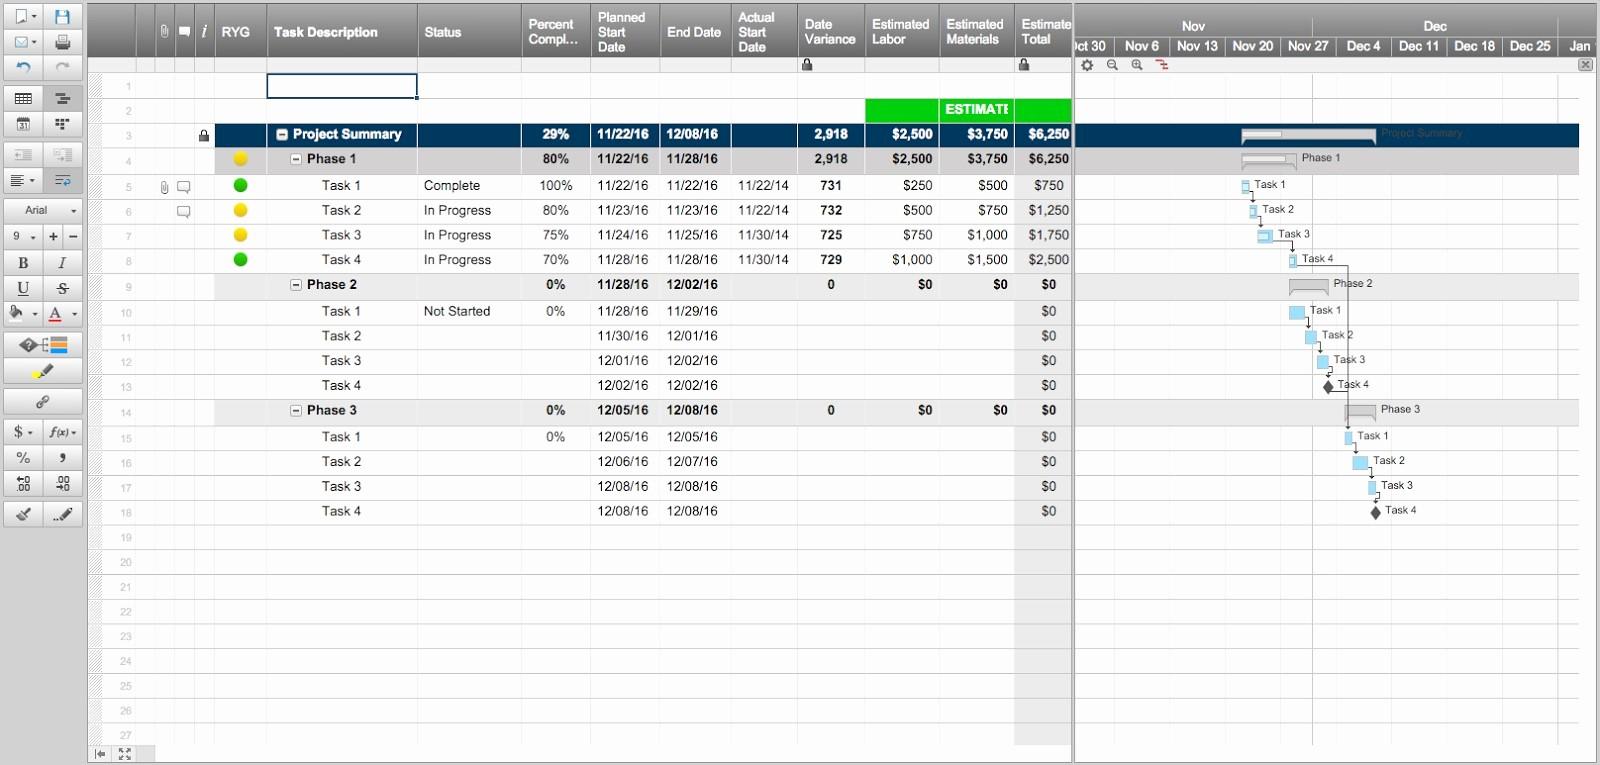 Task List Template Excel Spreadsheet Best Of Task List Template Excel Spreadsheet